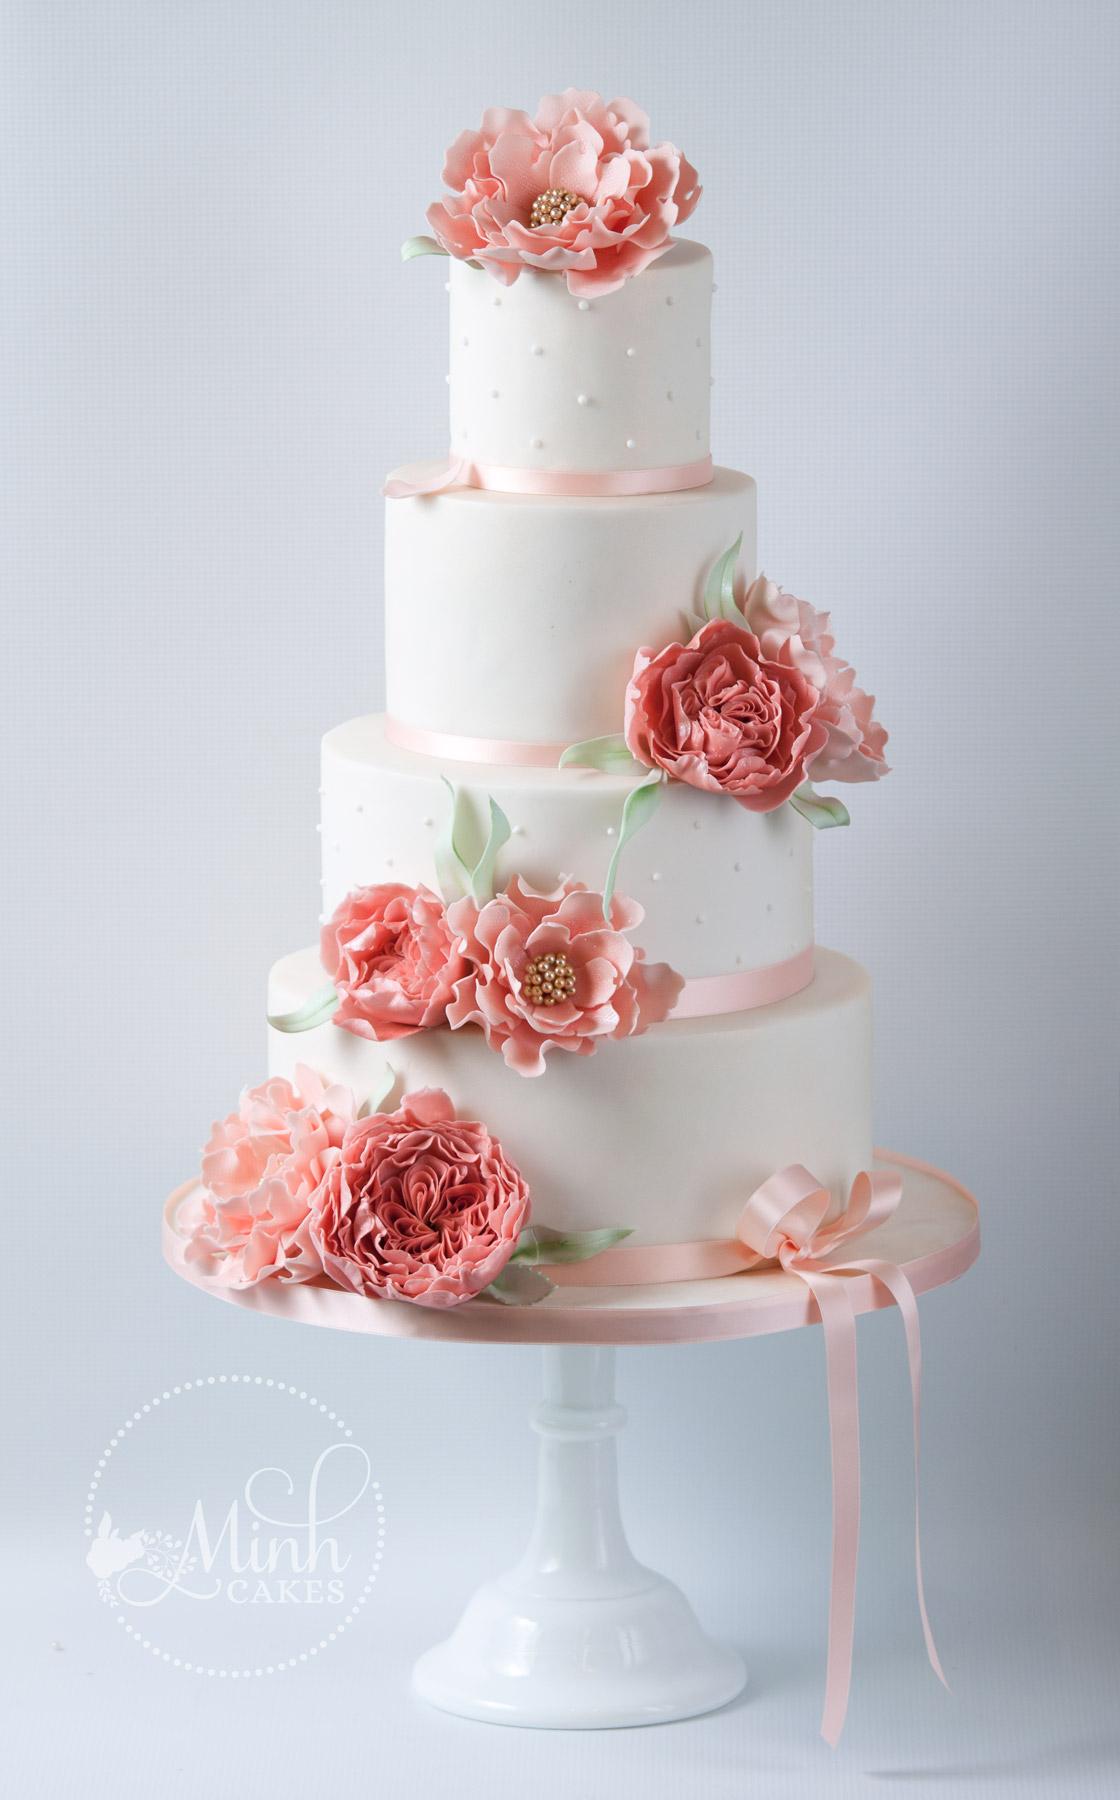 Tasting Wedding Cakes